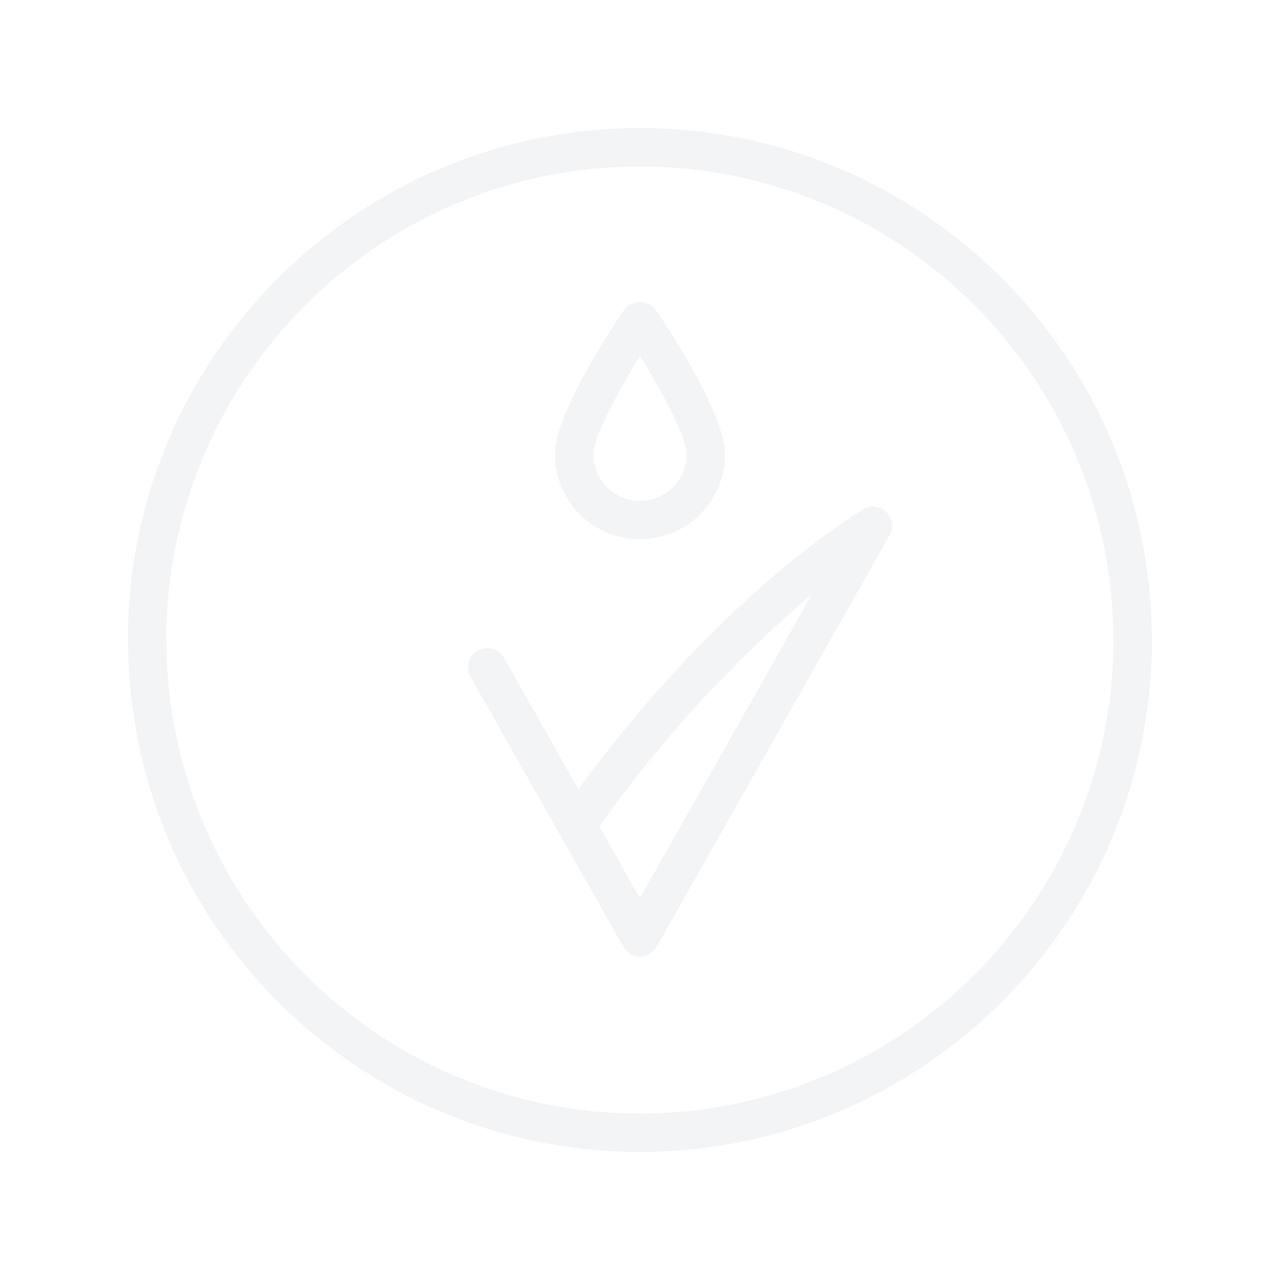 ARTDECO Mineral Lip Styler 0.4g